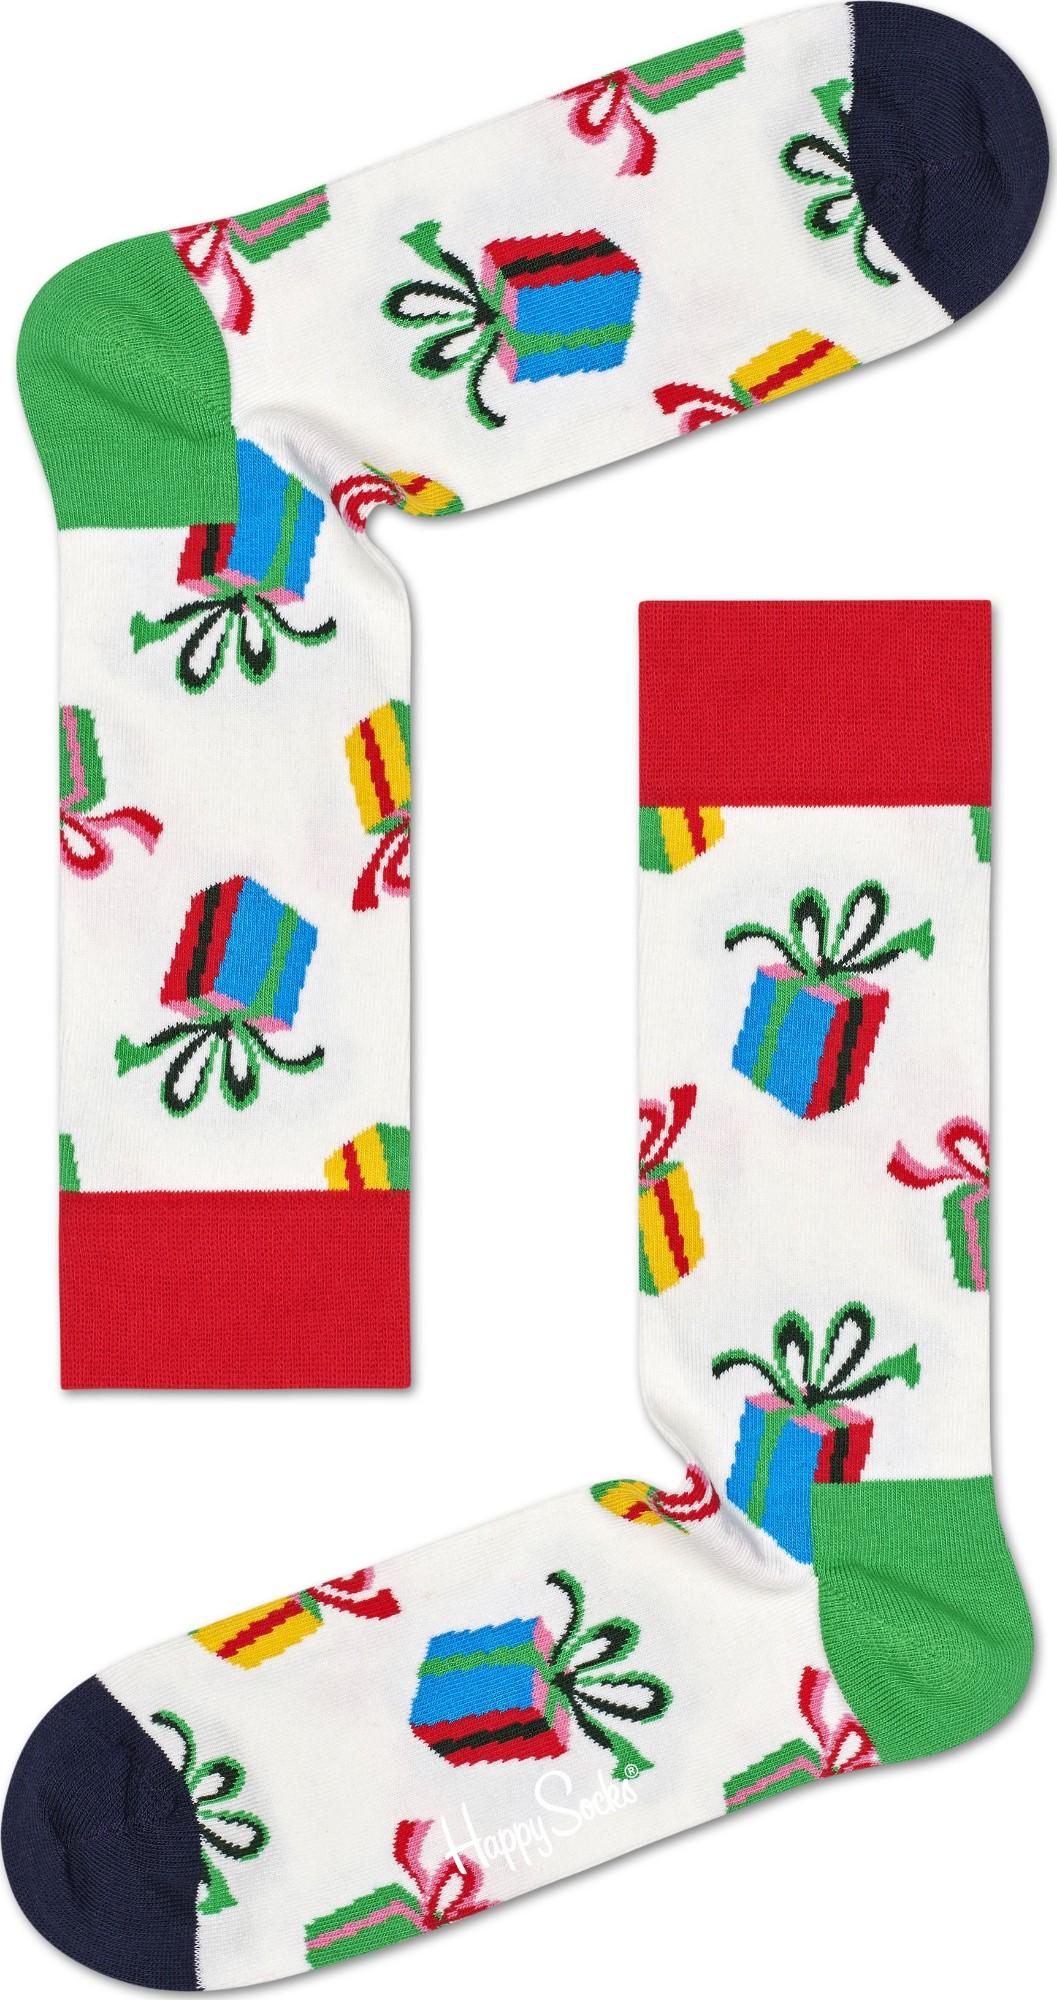 Happy Socks Presents Multi 1300 36-40